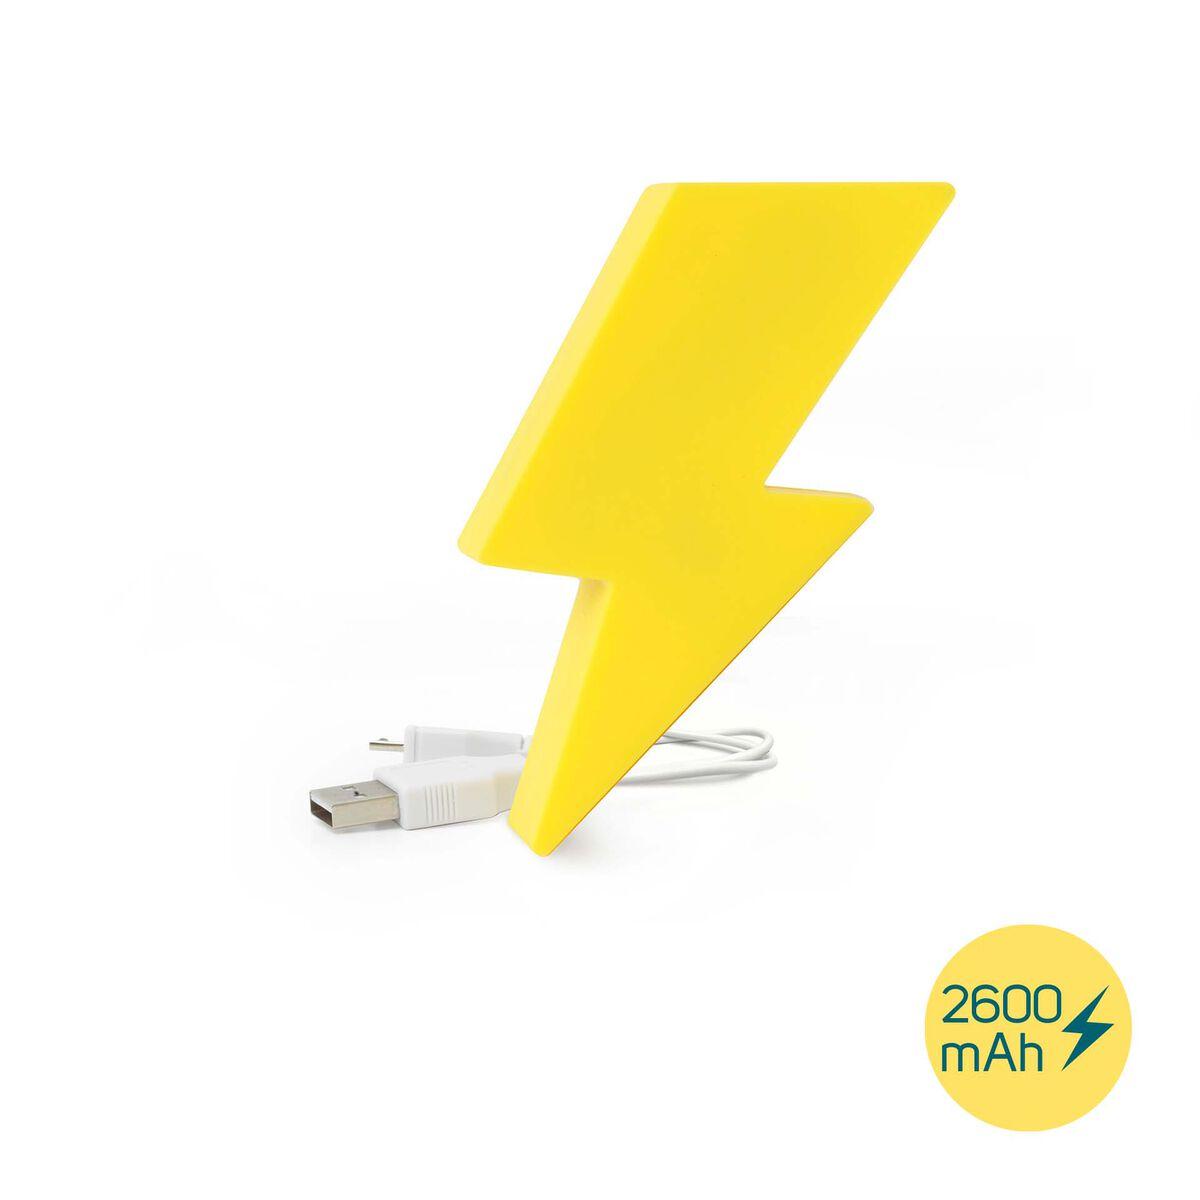 My Super Power - Batteria Ricaricabile, , zoo